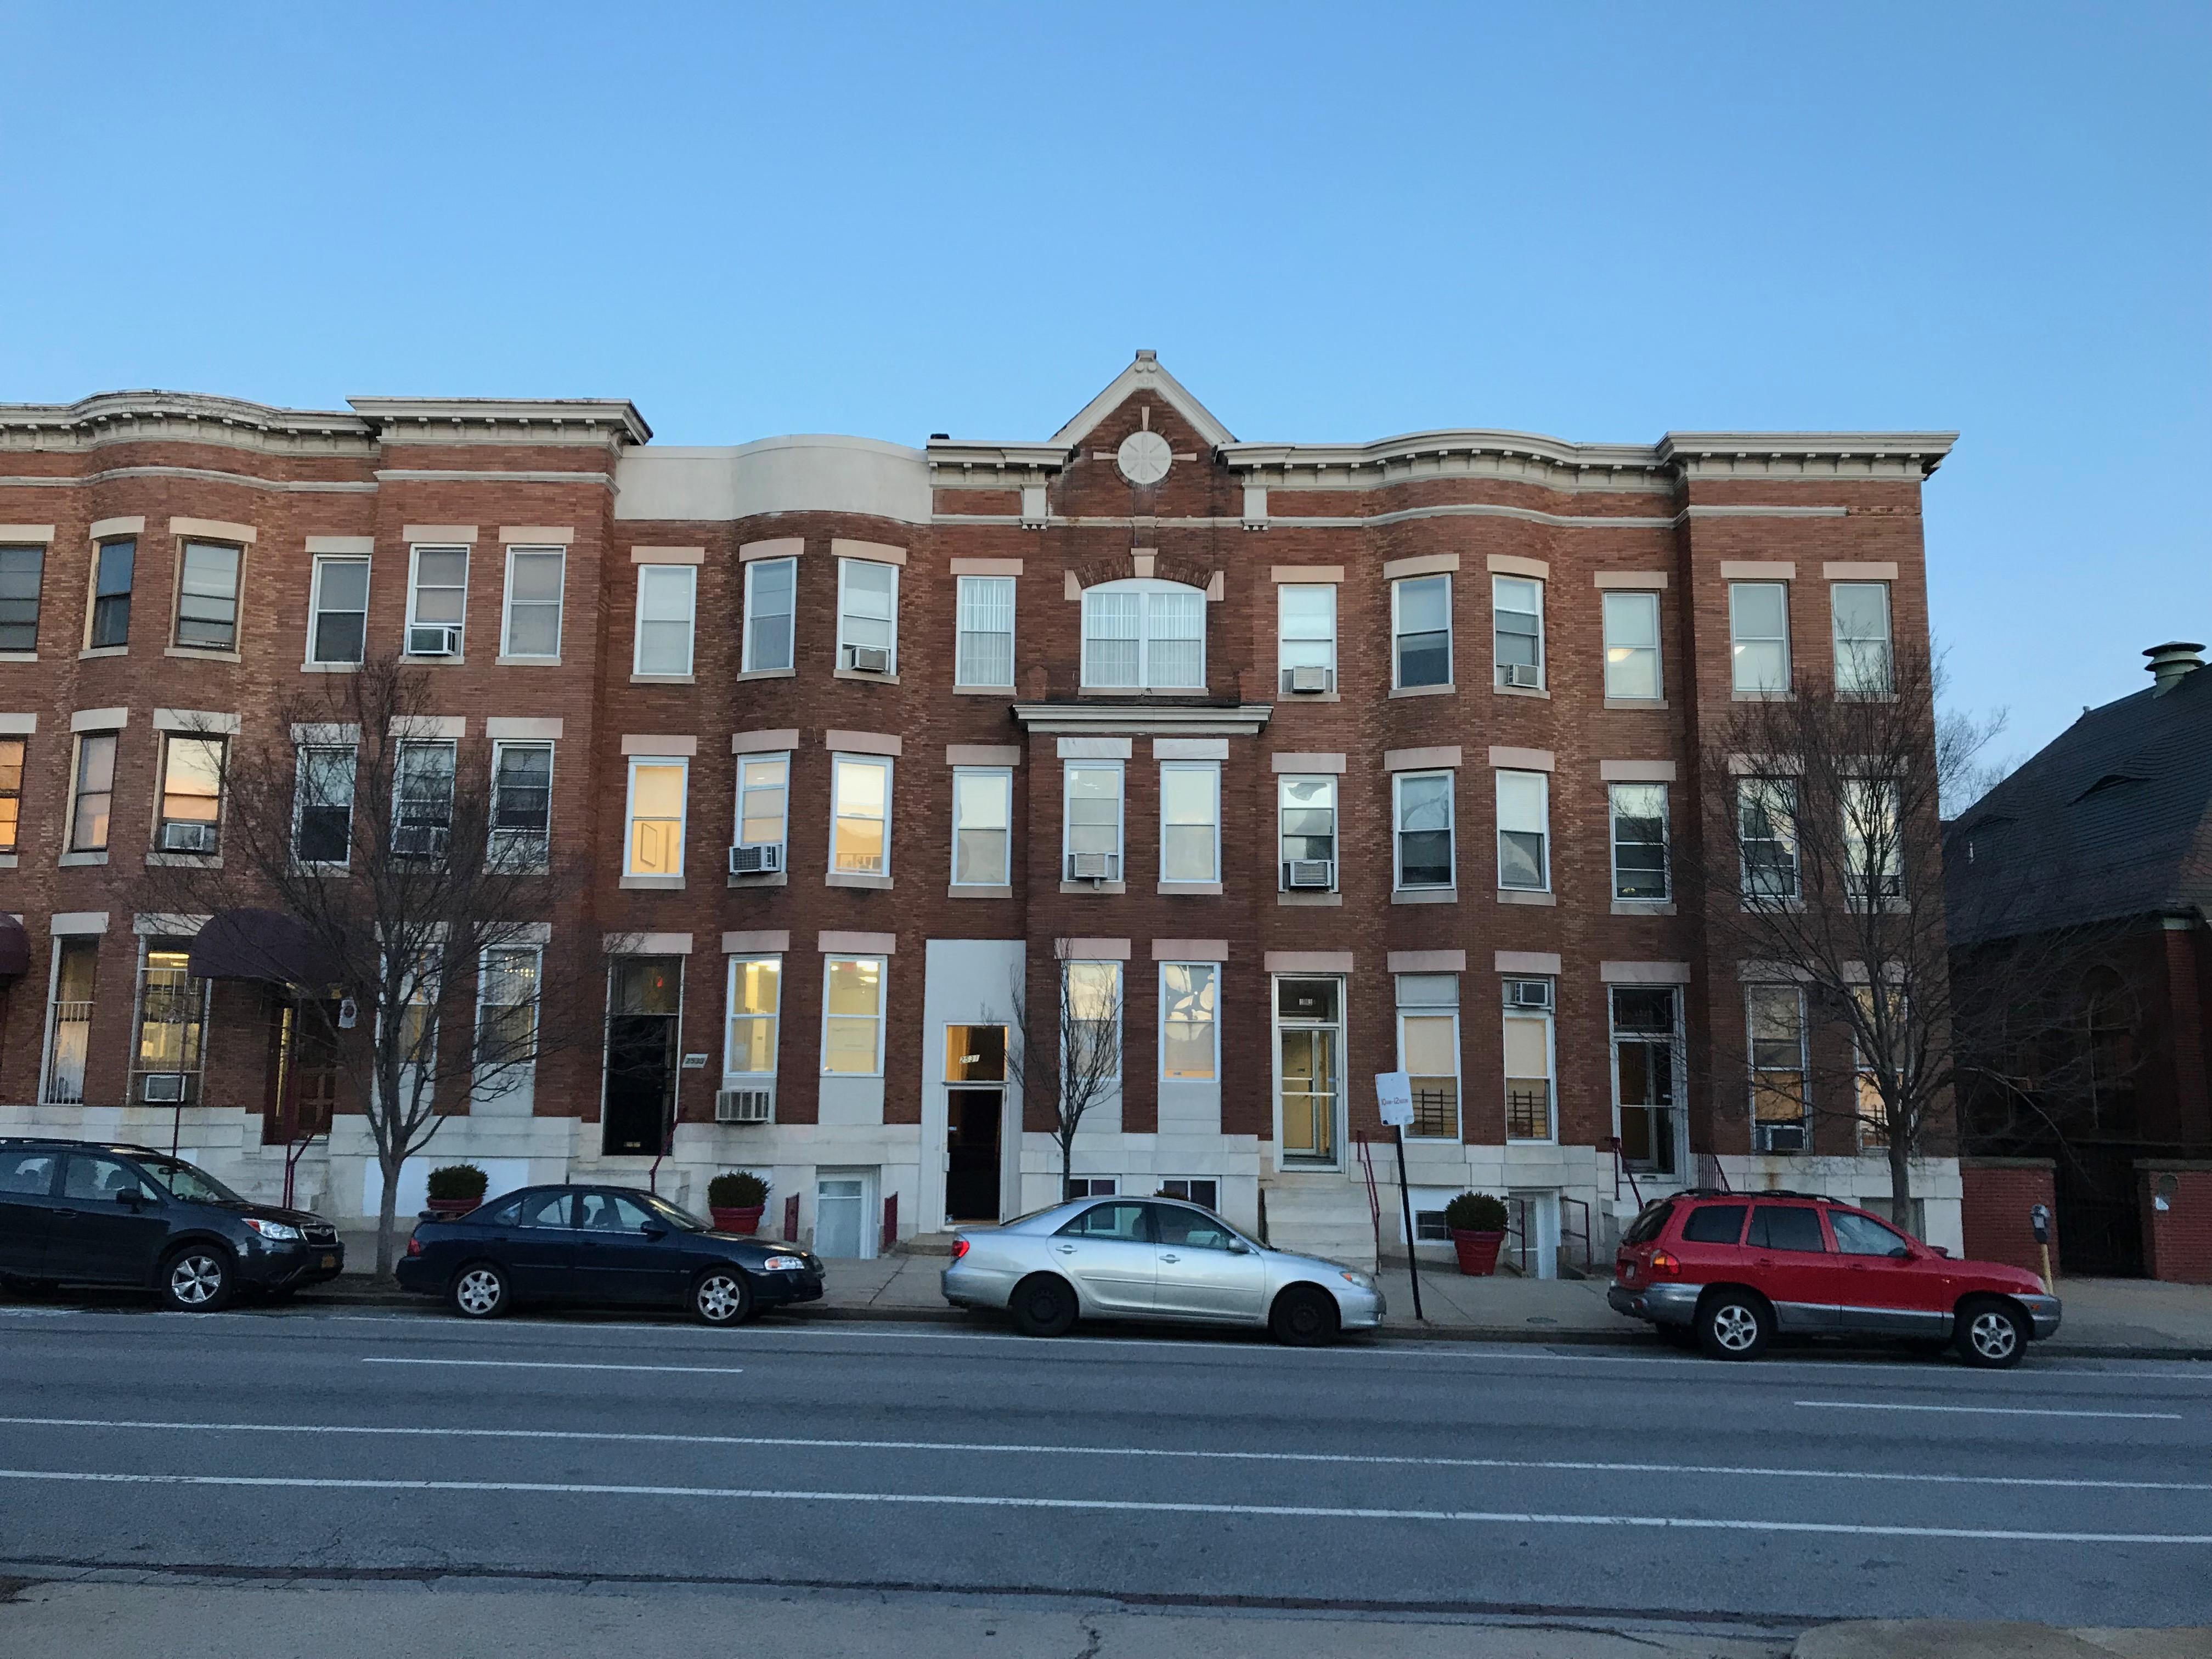 Rowhouse group, 2500 block of saint paul street, baltimore, md 21218 photo